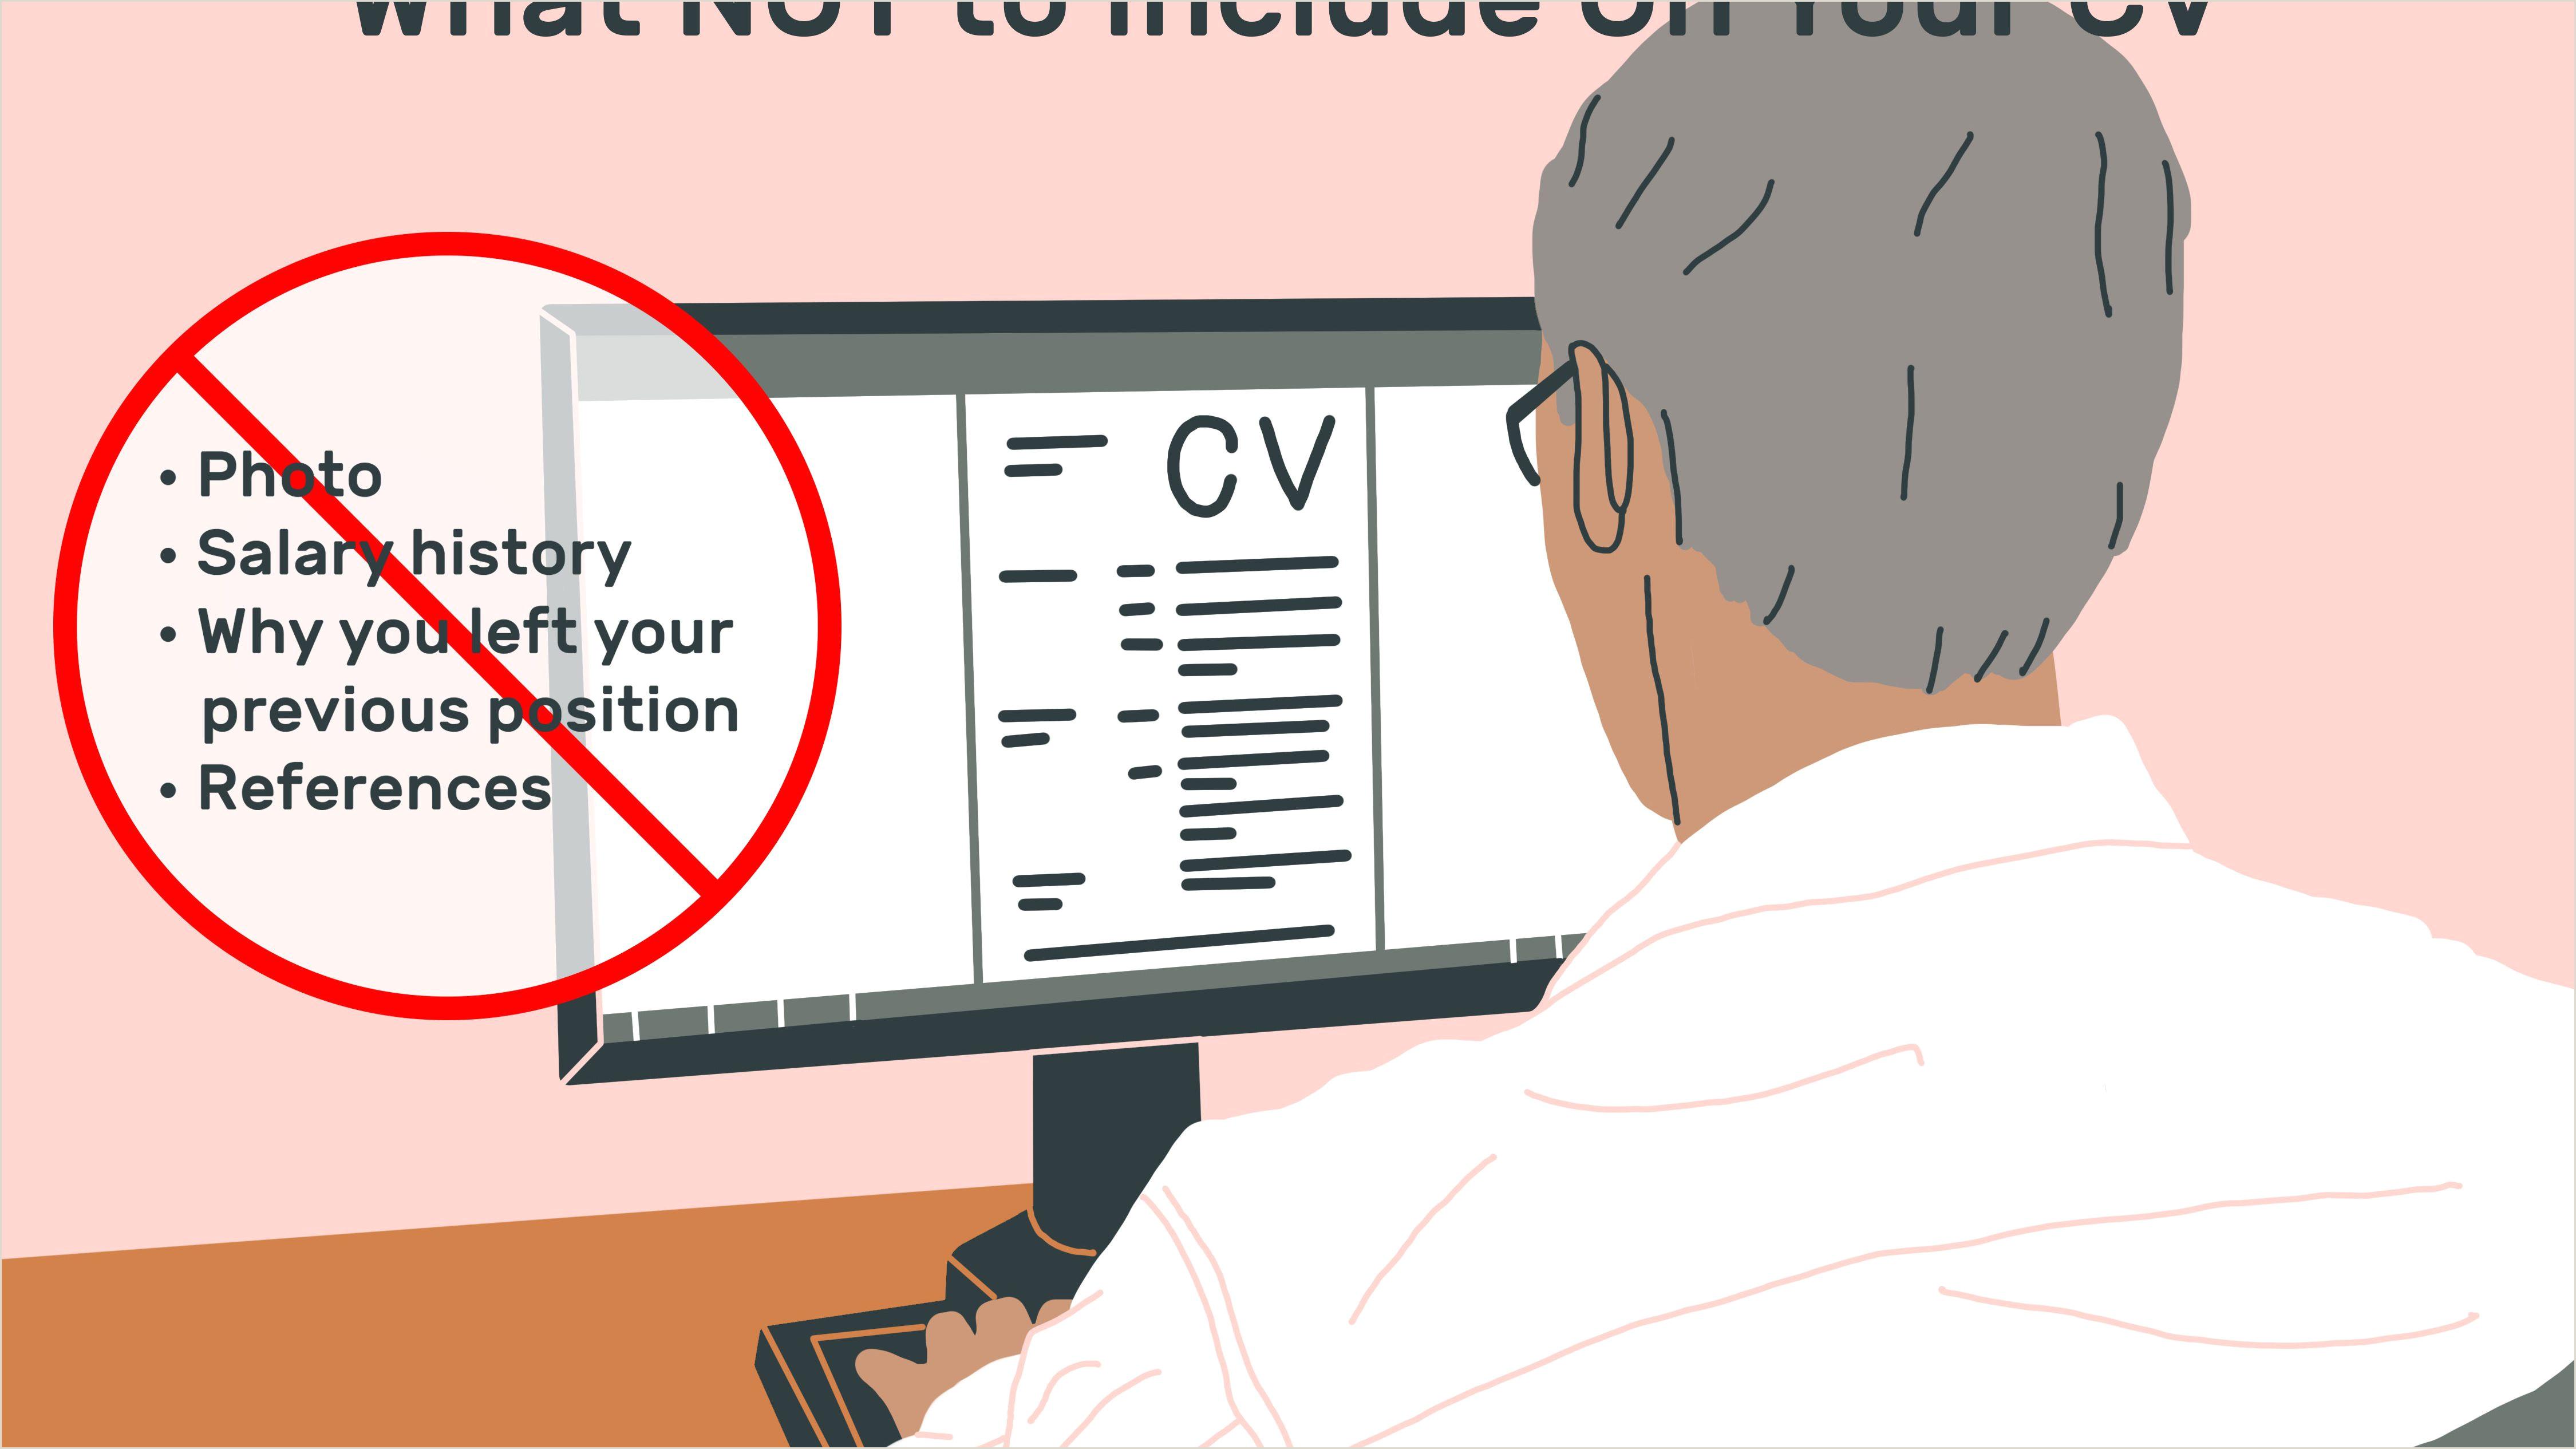 Salary History Template Microsoft Curriculum Vitae Cv Samples and Writing Tips